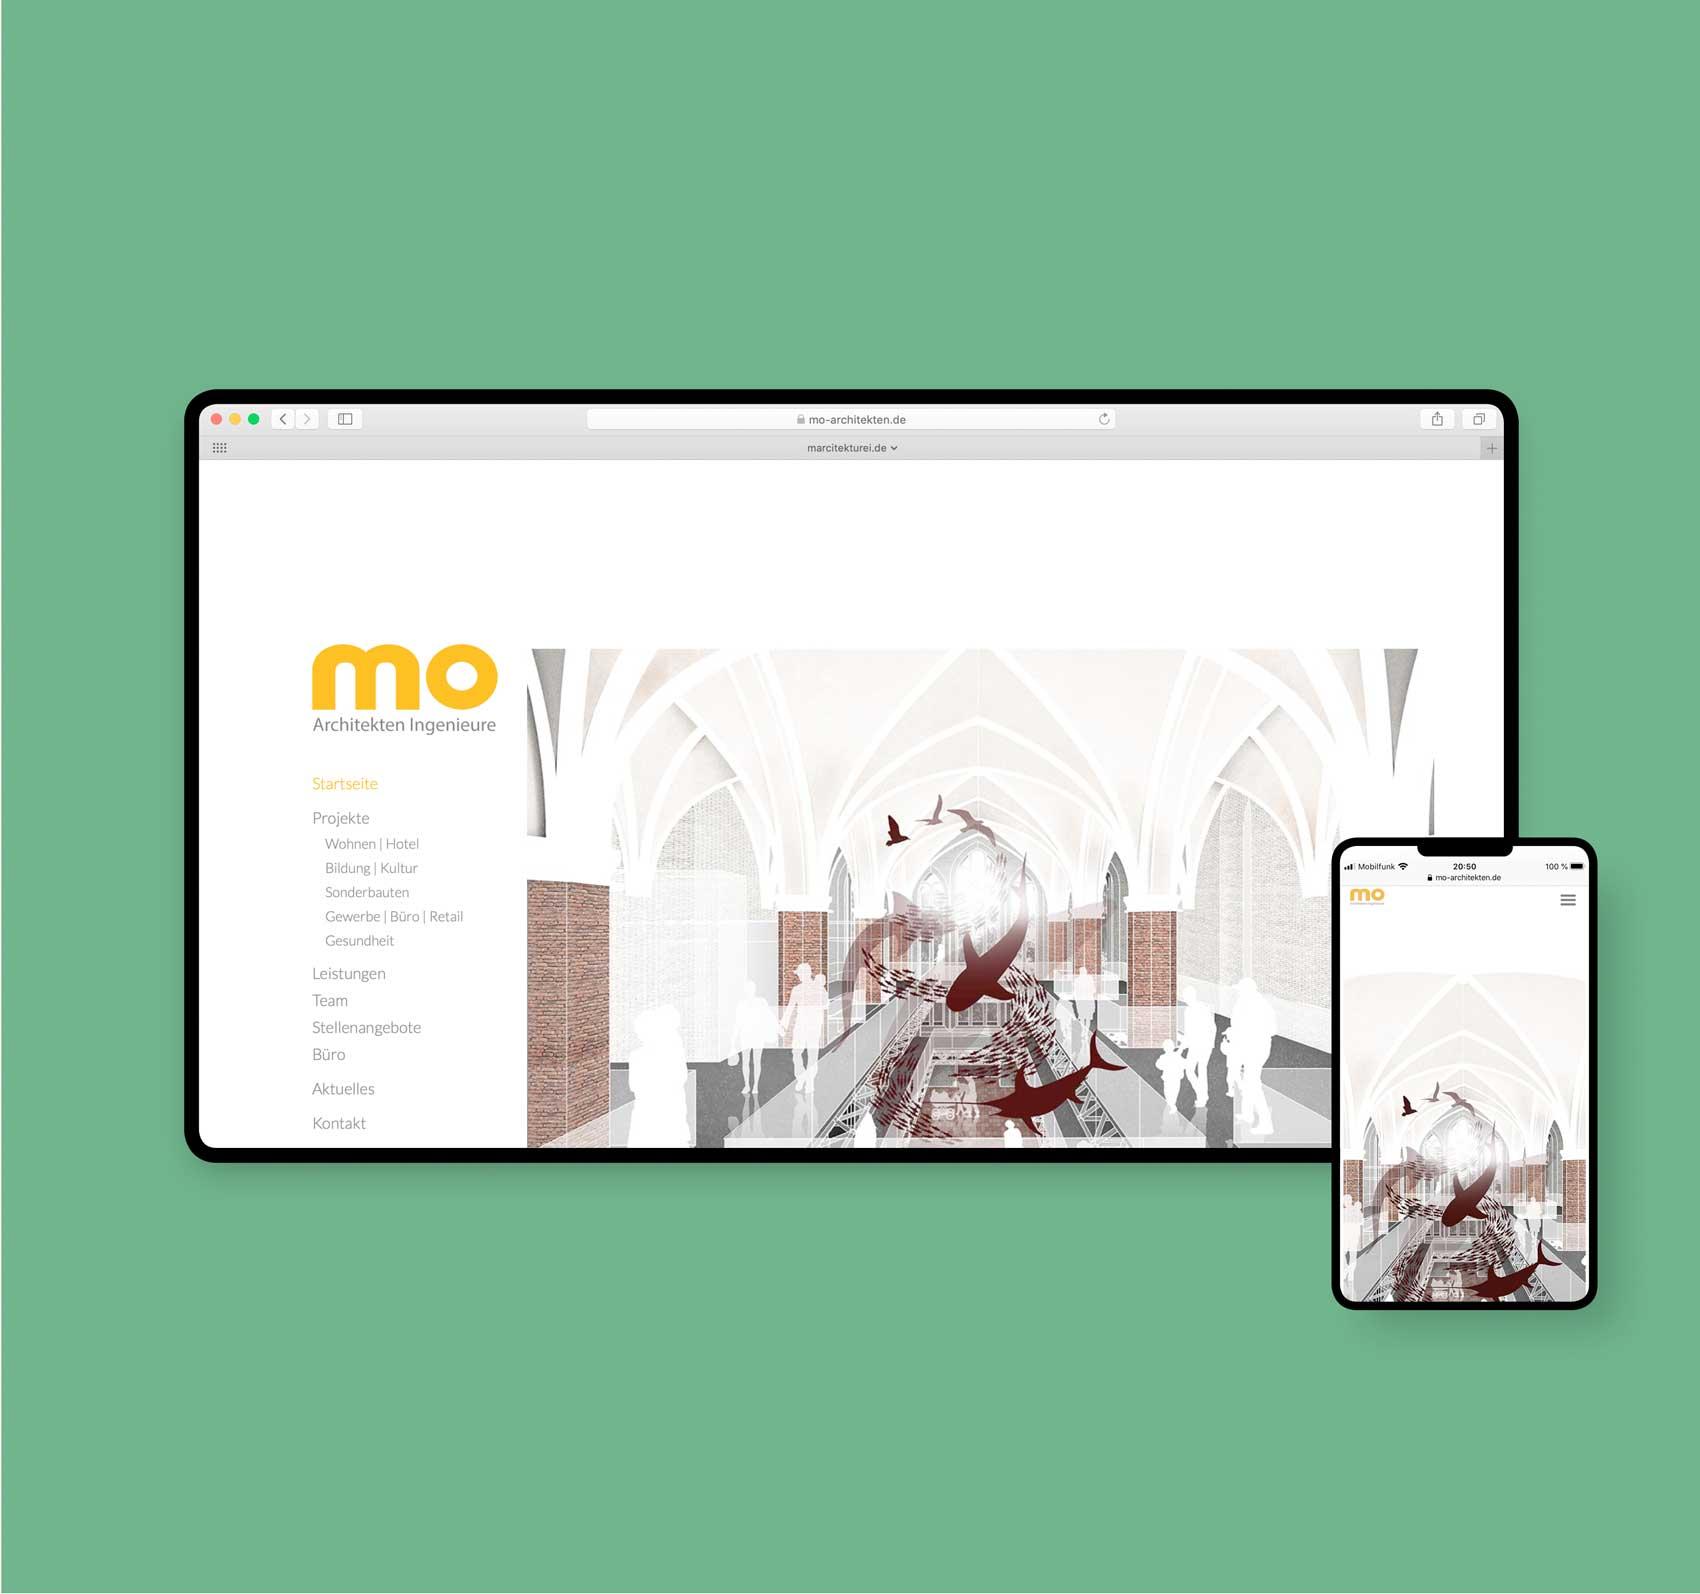 mo-Architekten Ingenieure